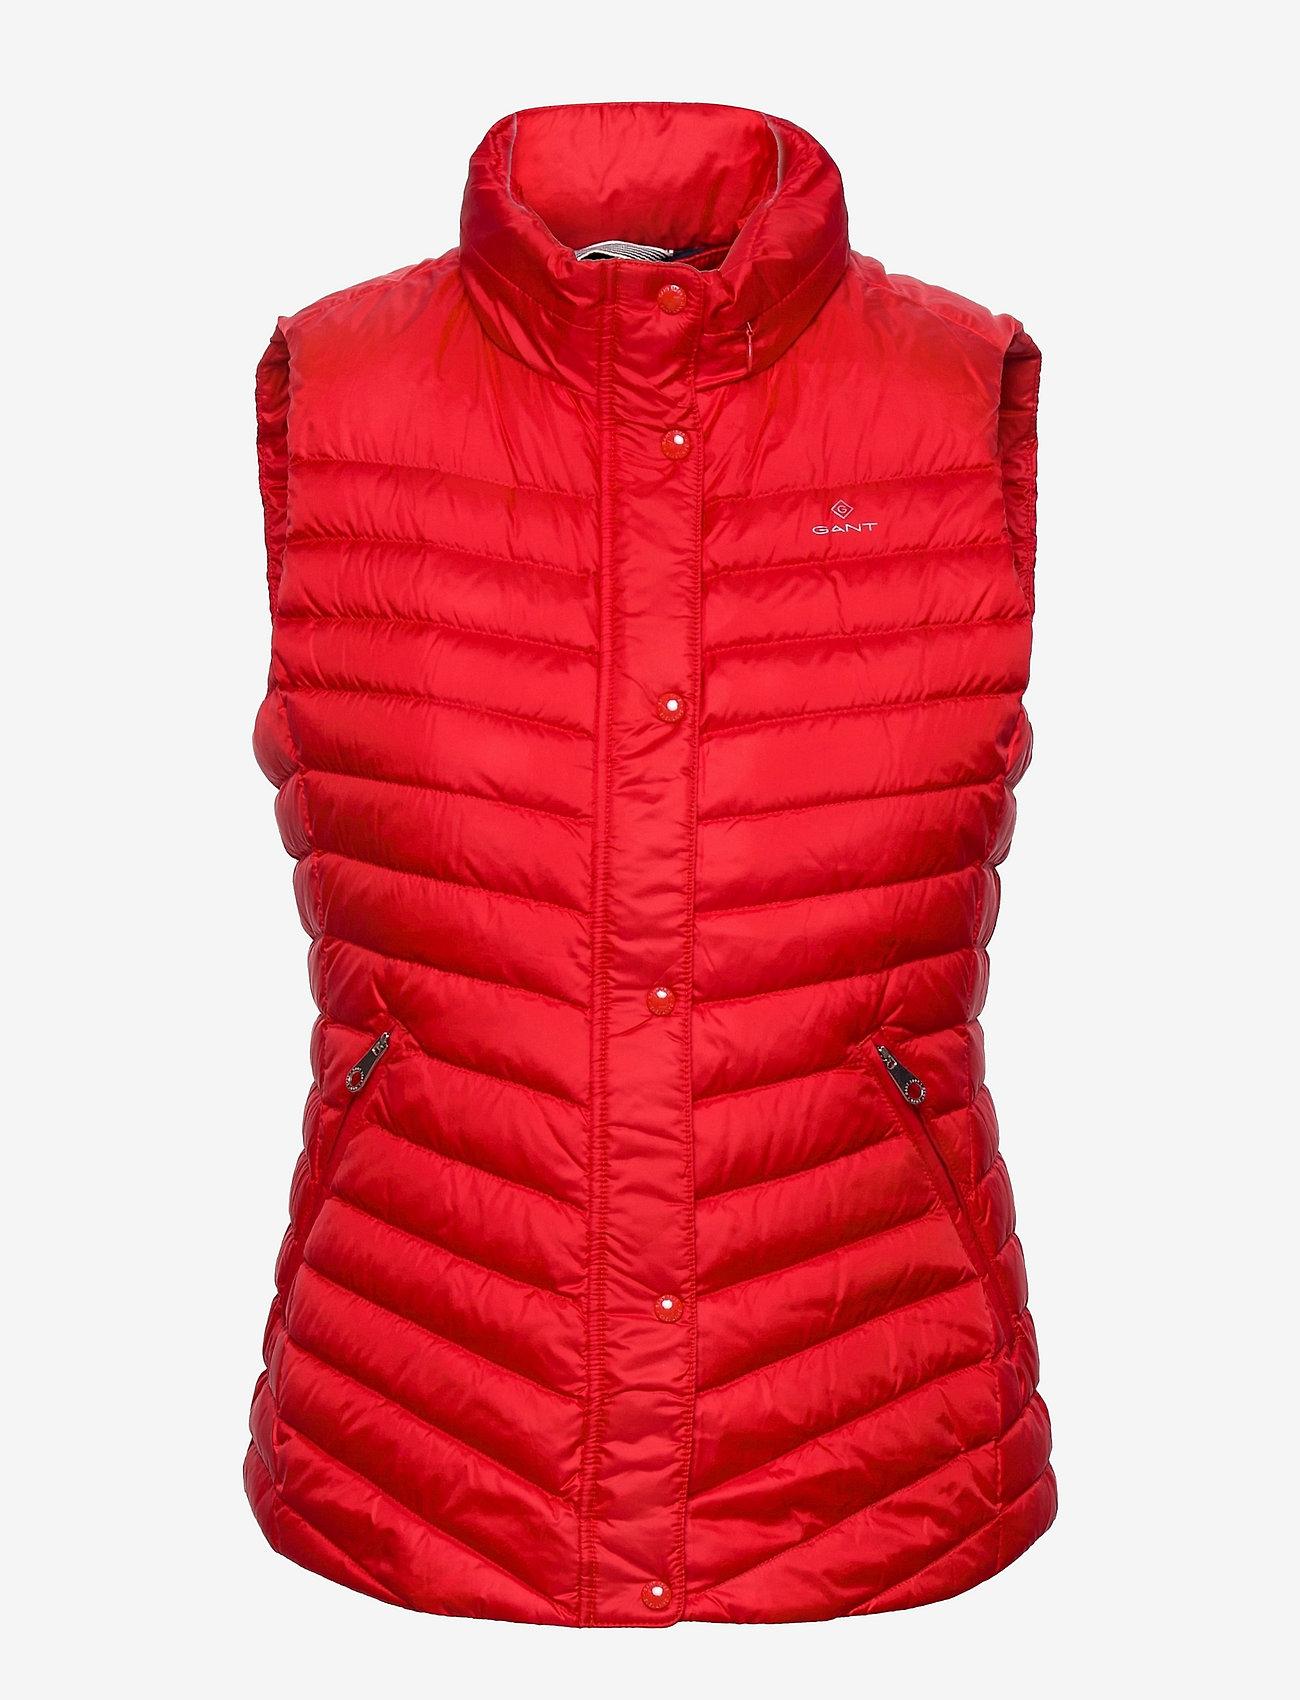 GANT - LIGHT DOWN GILET - puffer vests - bright red - 0